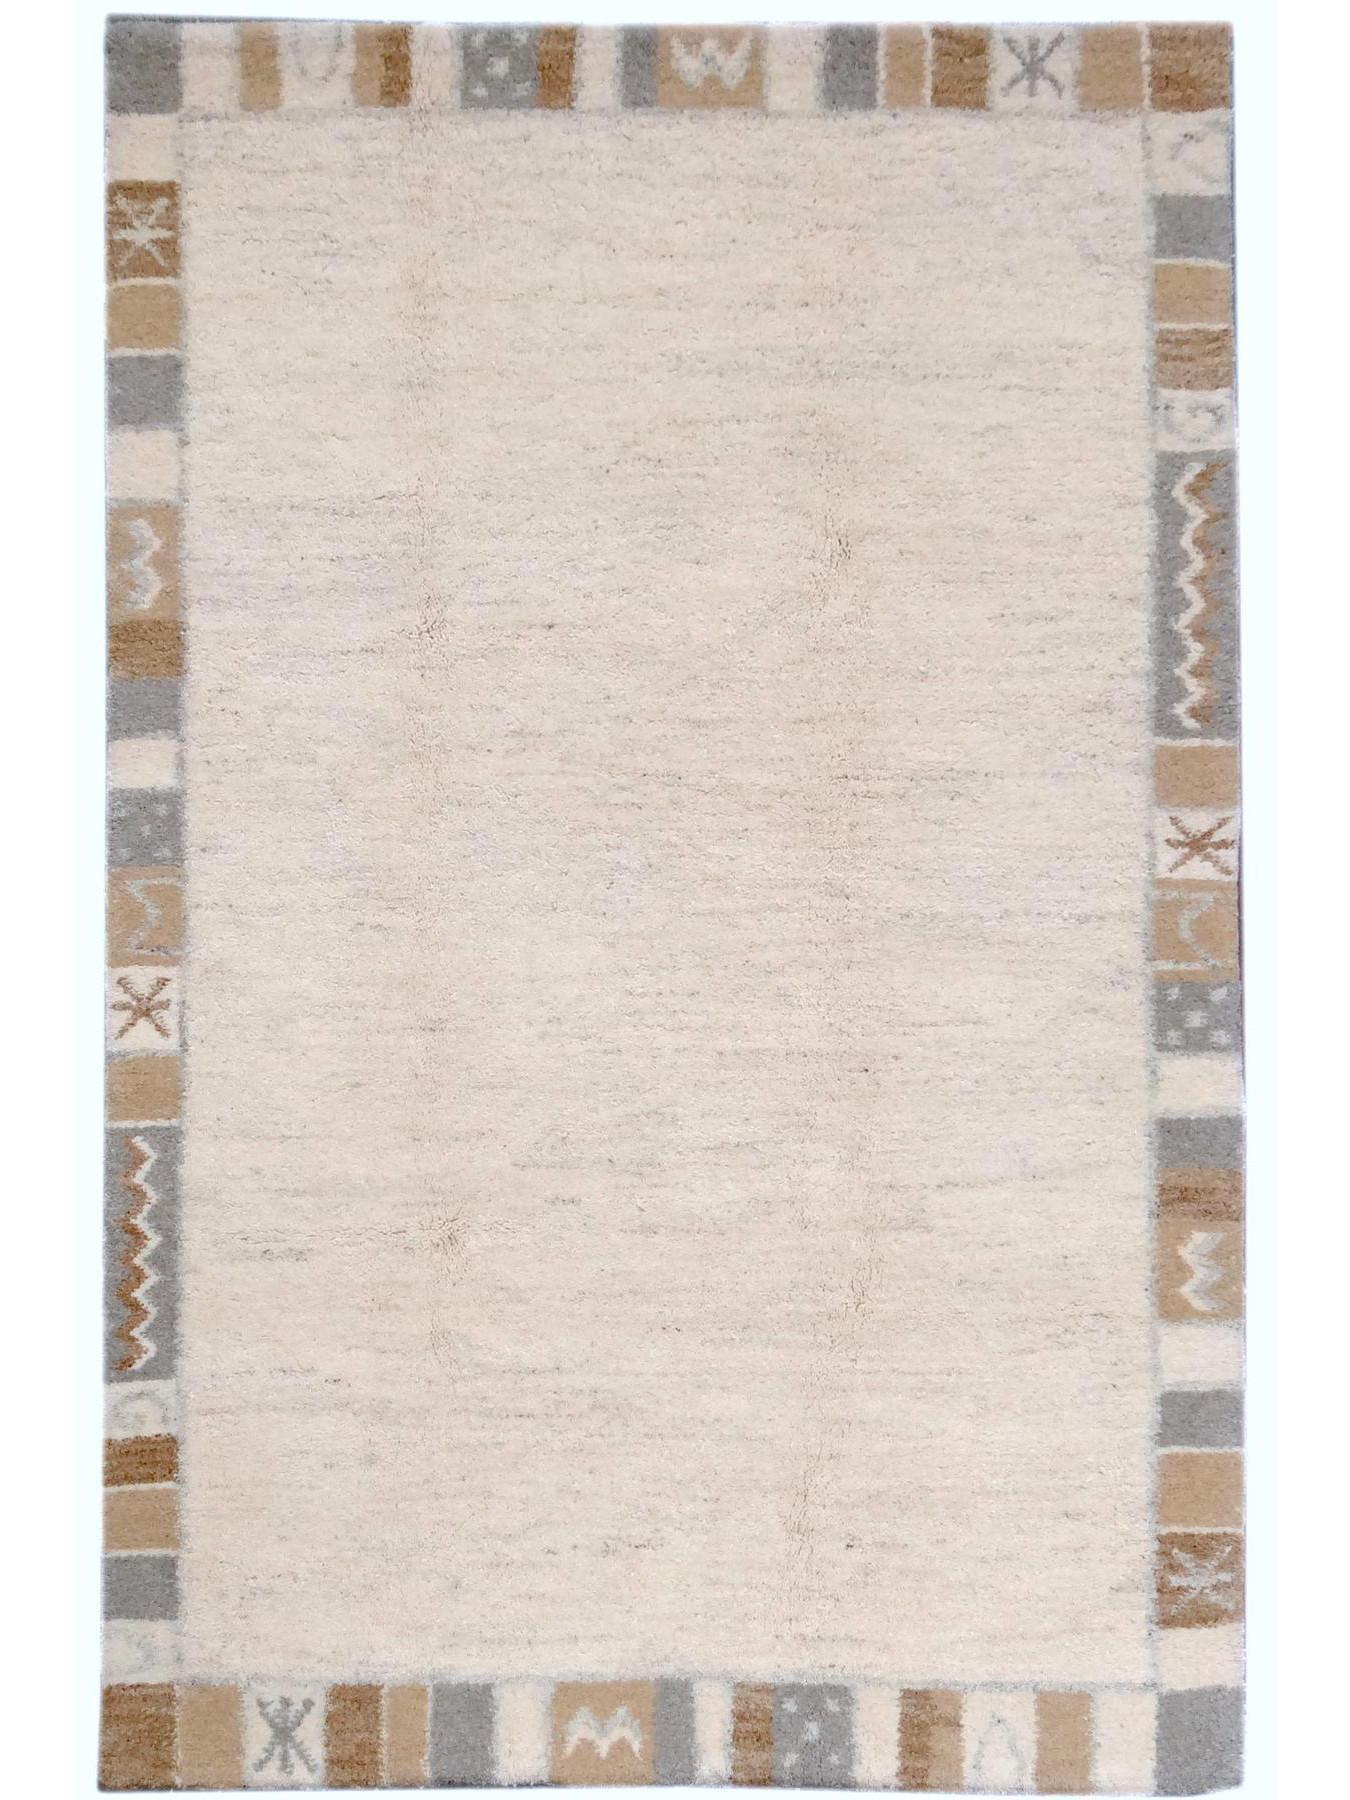 Berber tapijten - ATLAS 1 - 430